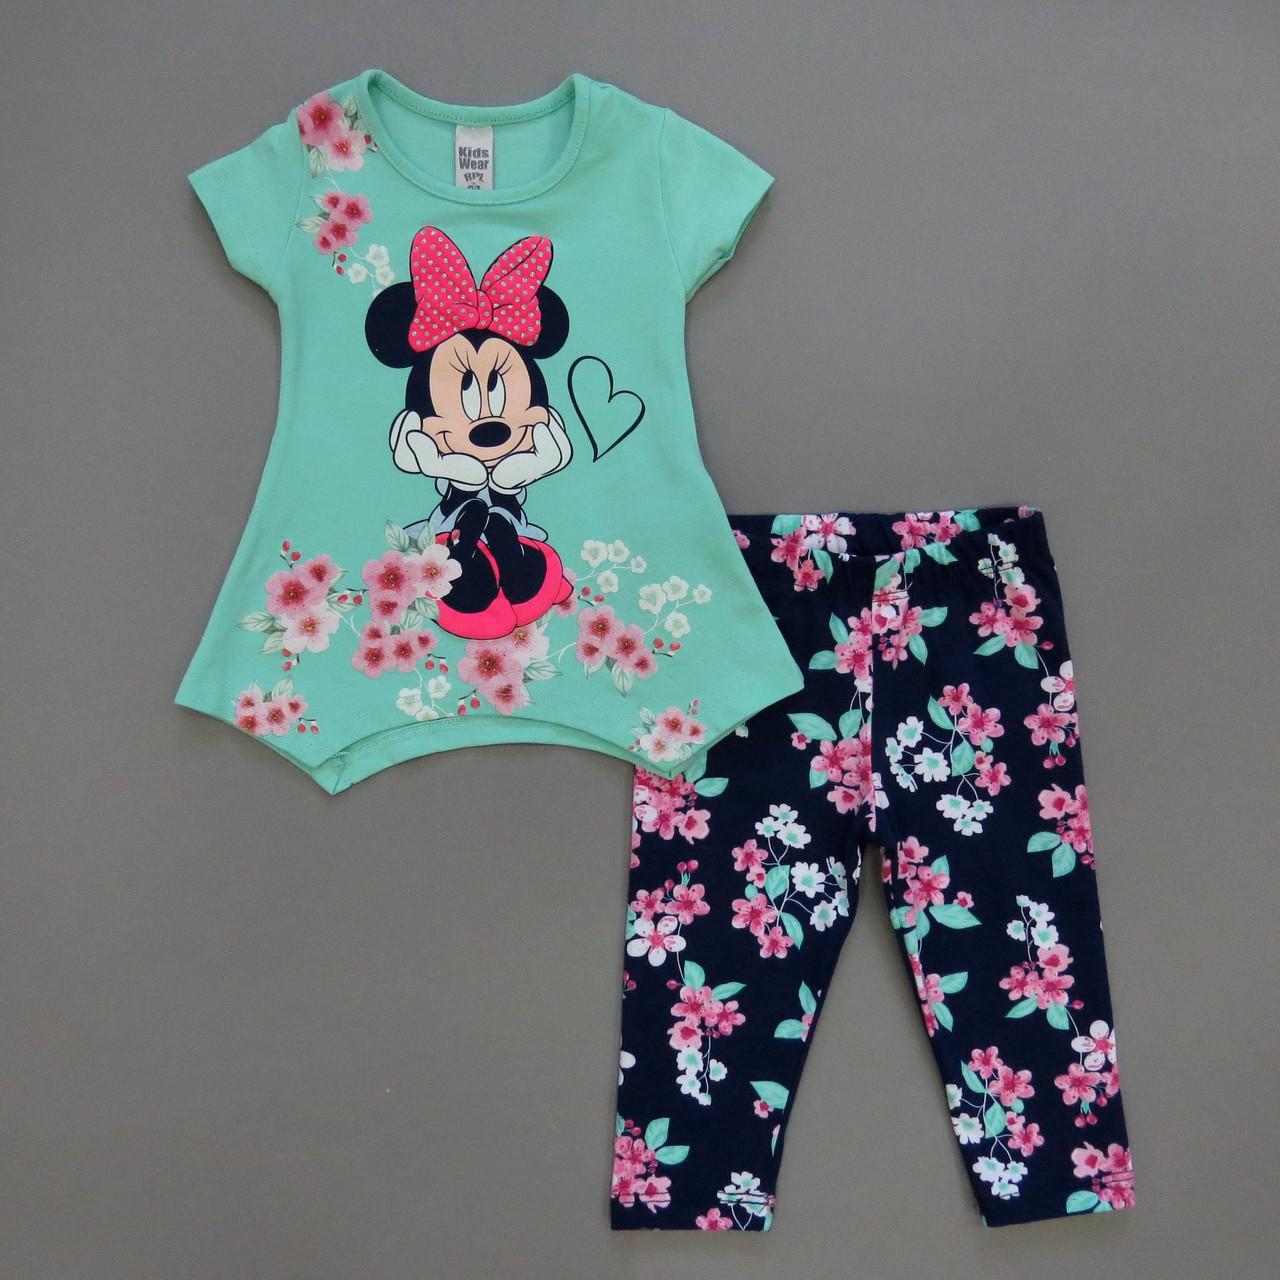 Летний костюм Minnie Mouse для девочки. Маломерит.